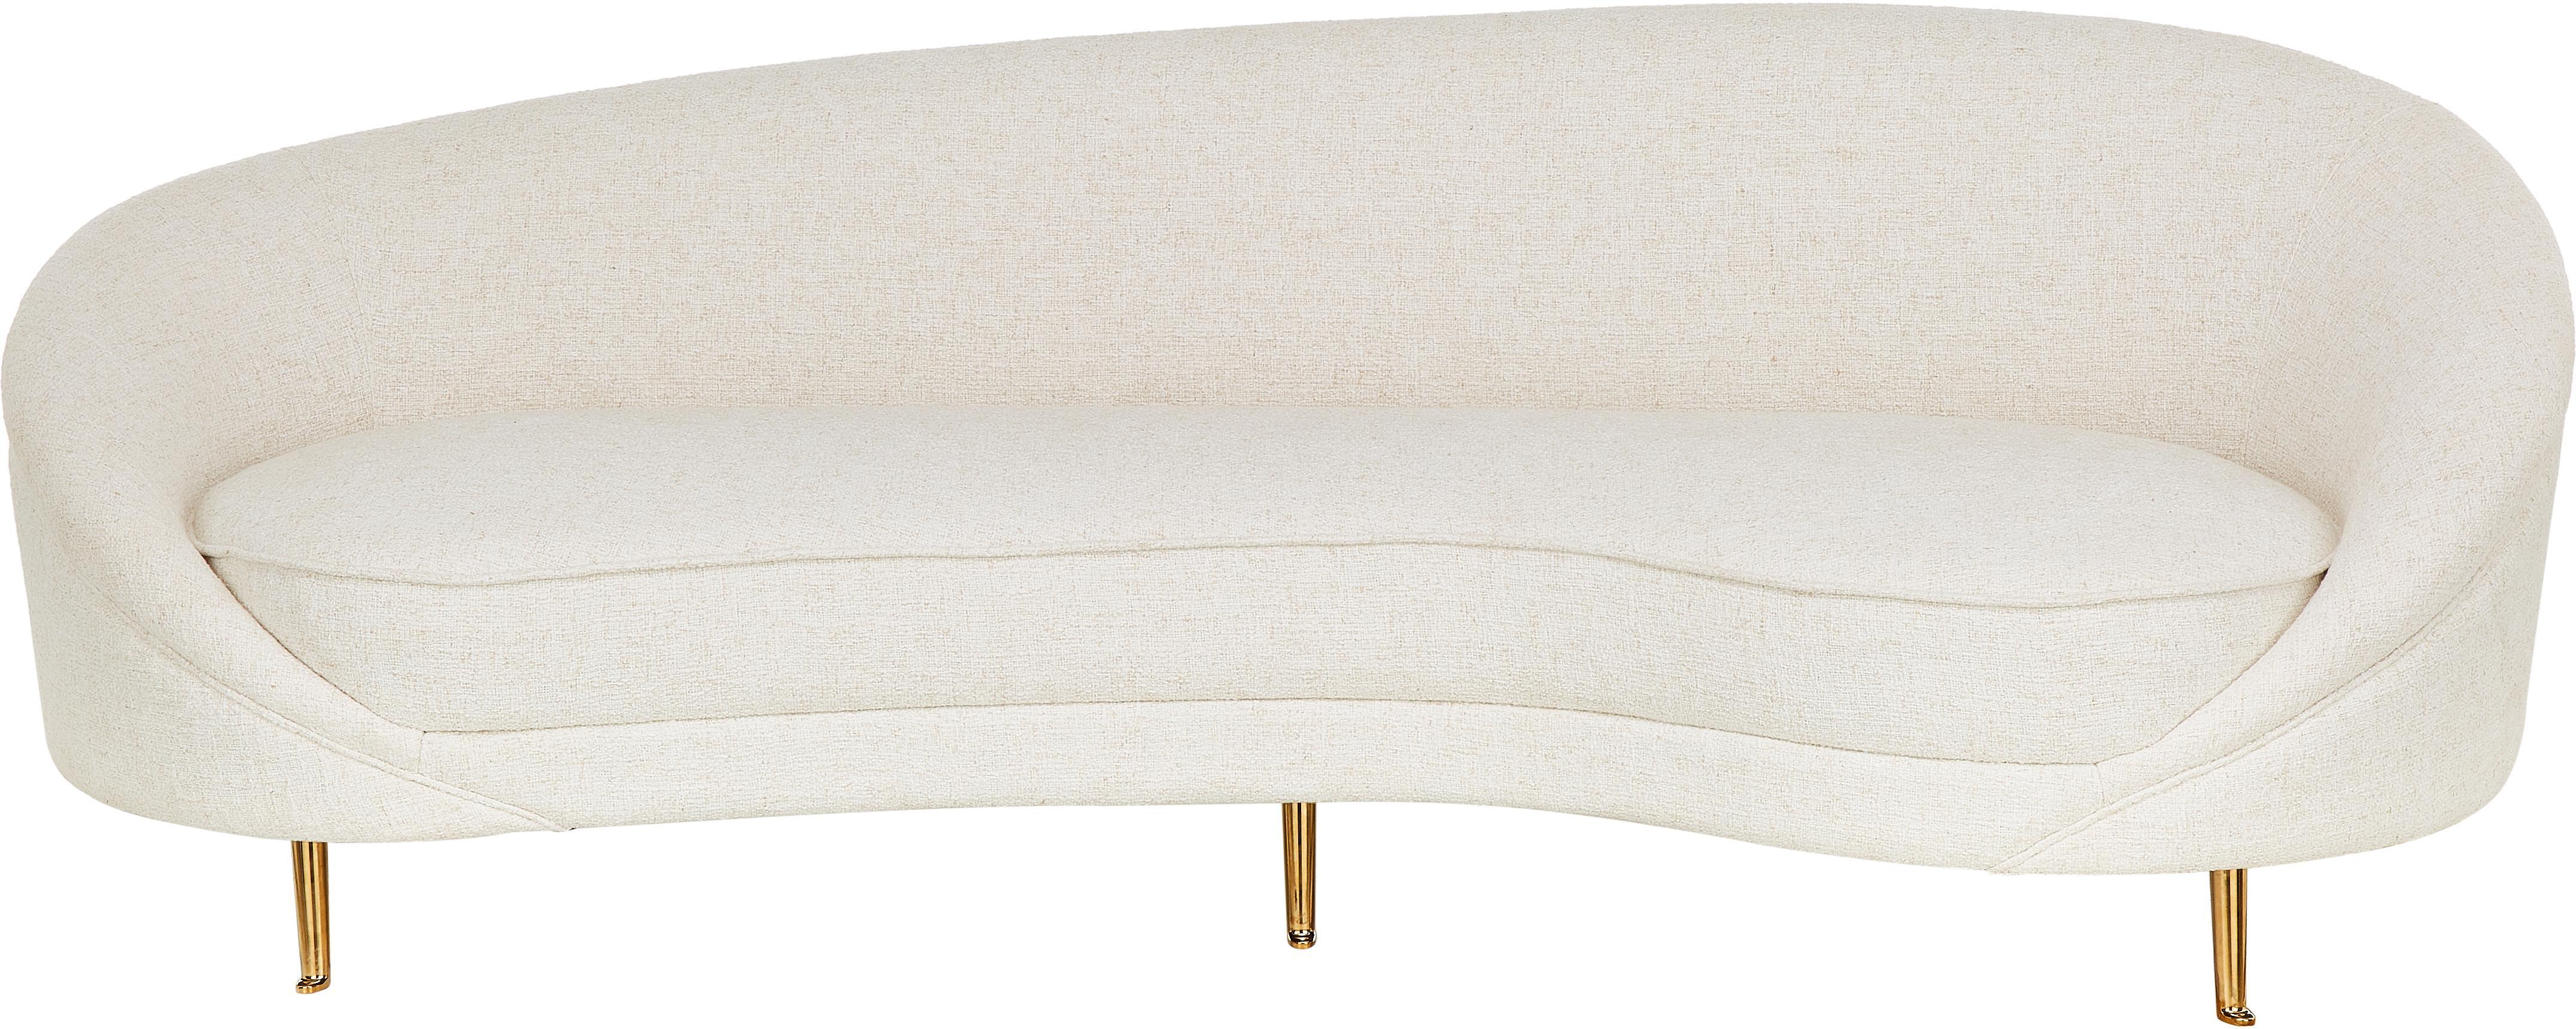 Sofá de tejido bouclé Gatsby (3plazas), Tapizado: tejido bouclé (70%poliés, Estructura: madera de eucalipto maciz, Patas: metal galvanizado, Bouclé beige, An 245 x F 102 cm